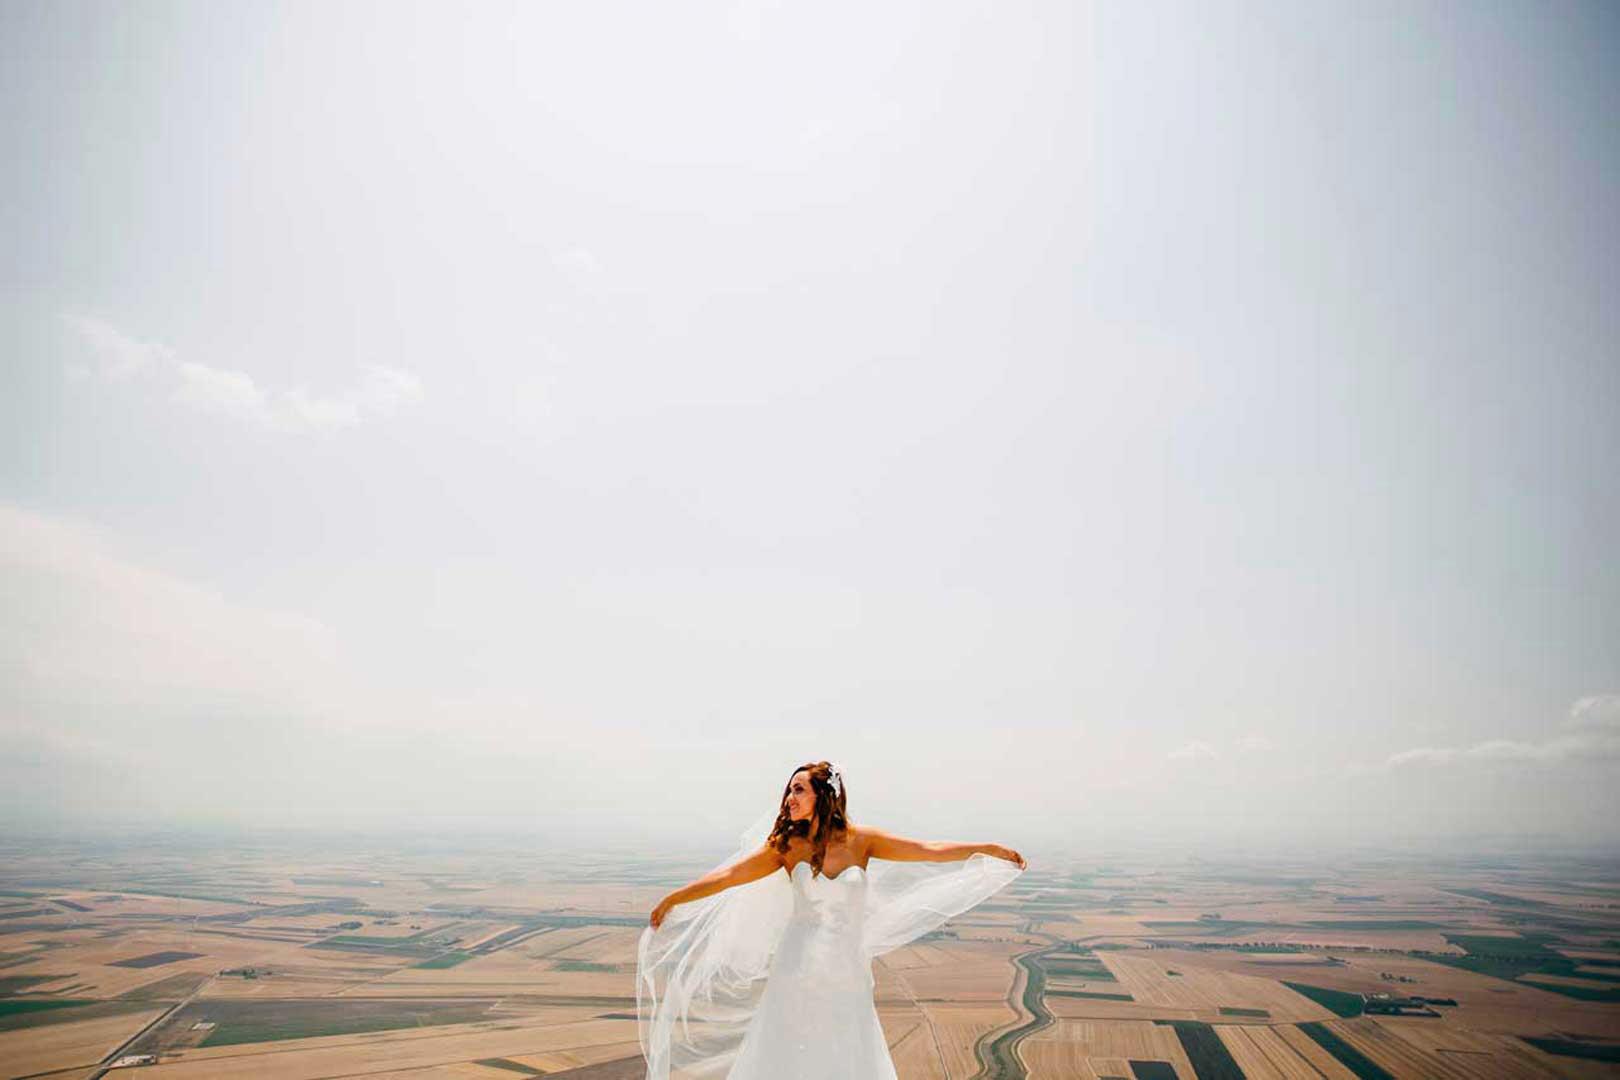 023-panorama-matrimonio-puglia-gianni-lepore-fotografo